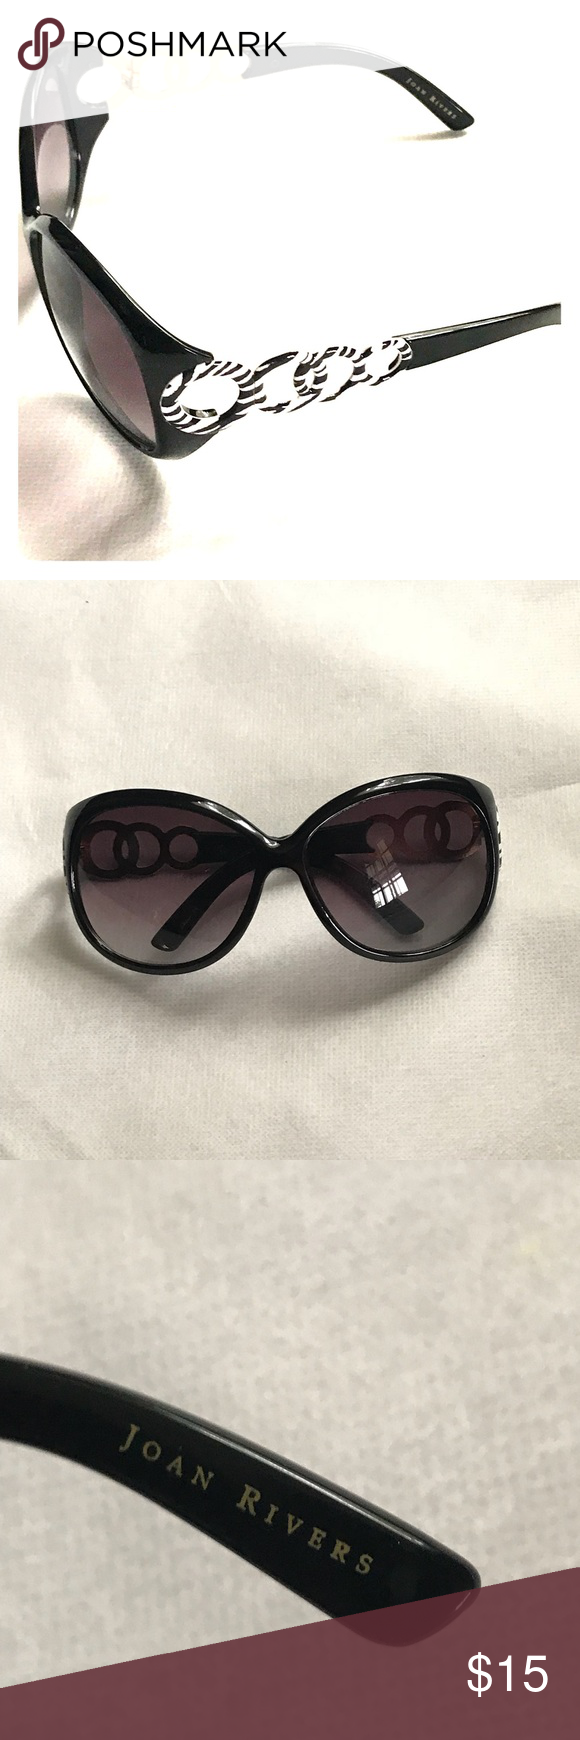 3773b16c6e0b0 Joan Rivers Sunglasses Look of Glamor Black and White Joan Rivers  Accessories Sunglasses